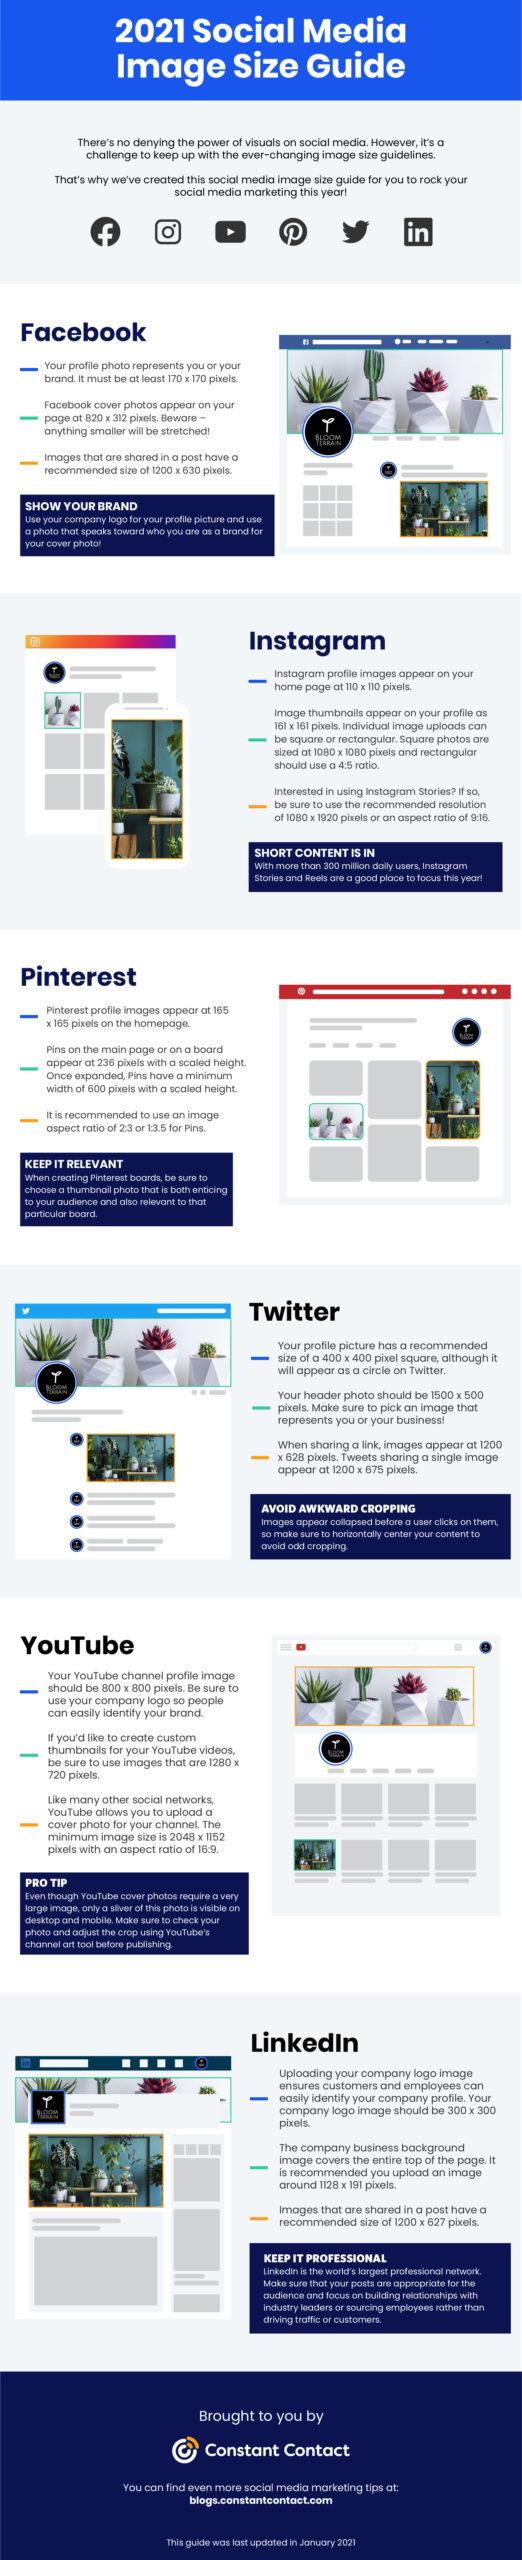 Social Media Image Sizes 2021